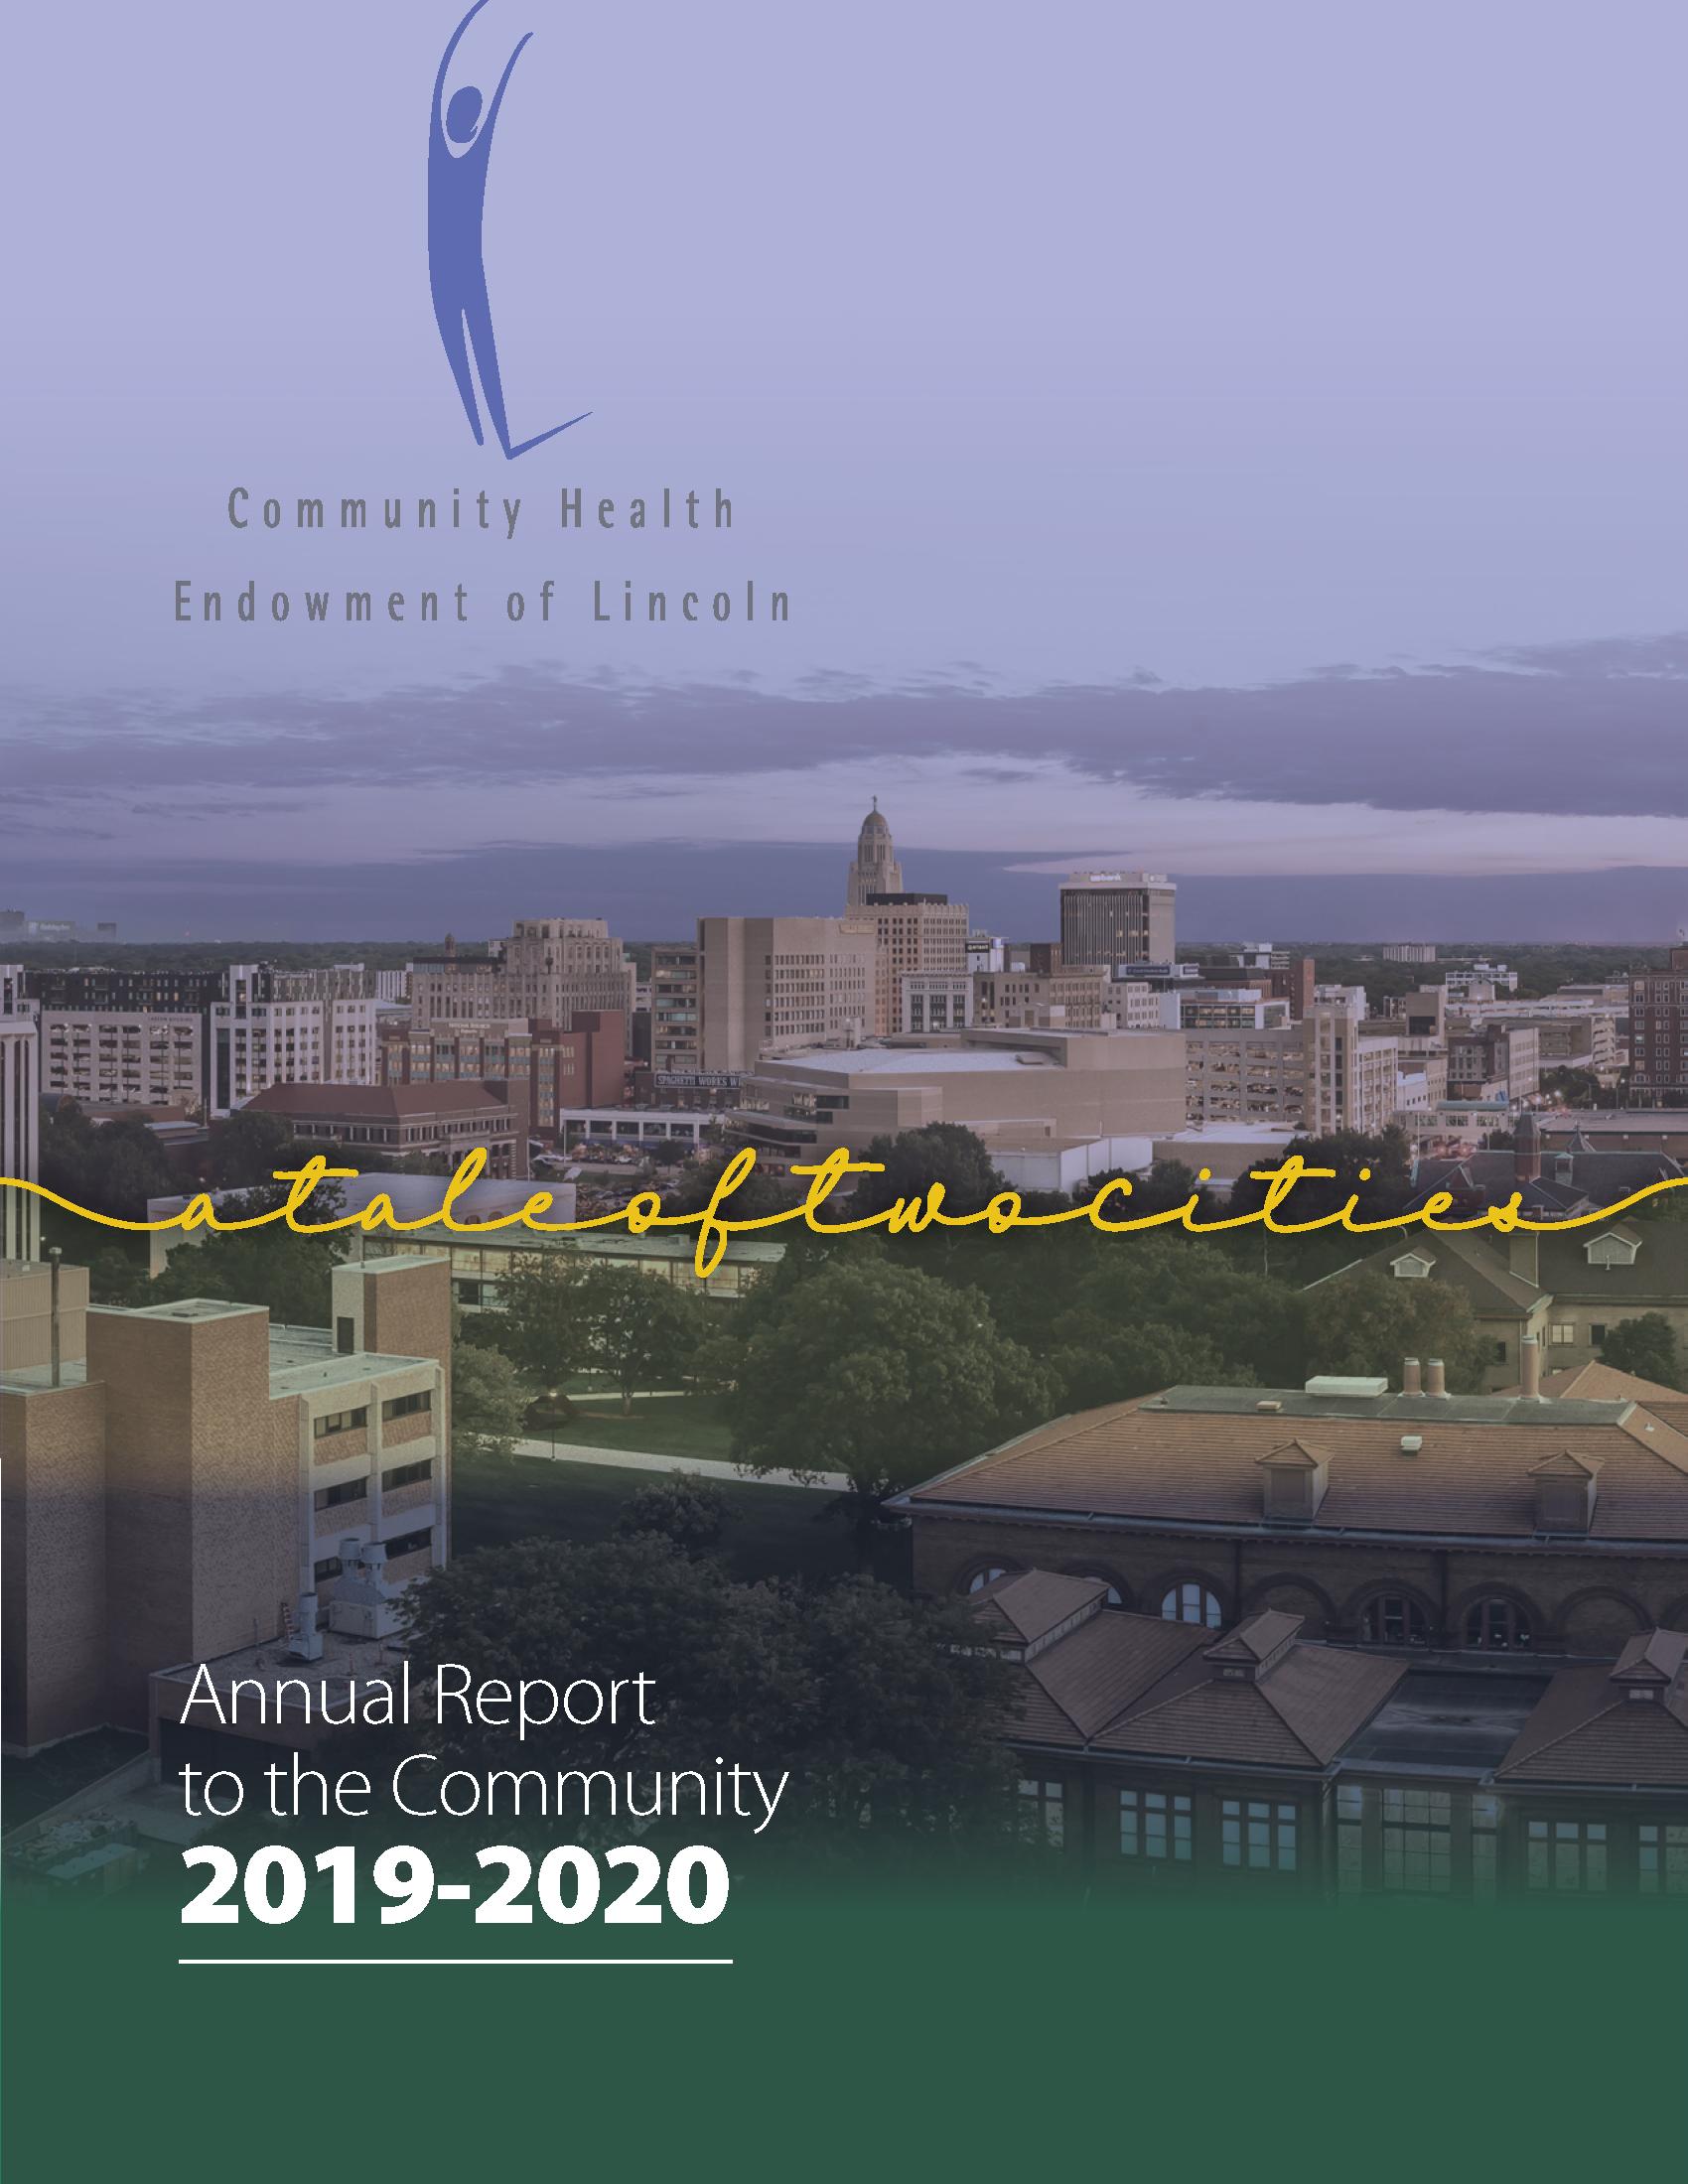 Annual Report 2019-2020